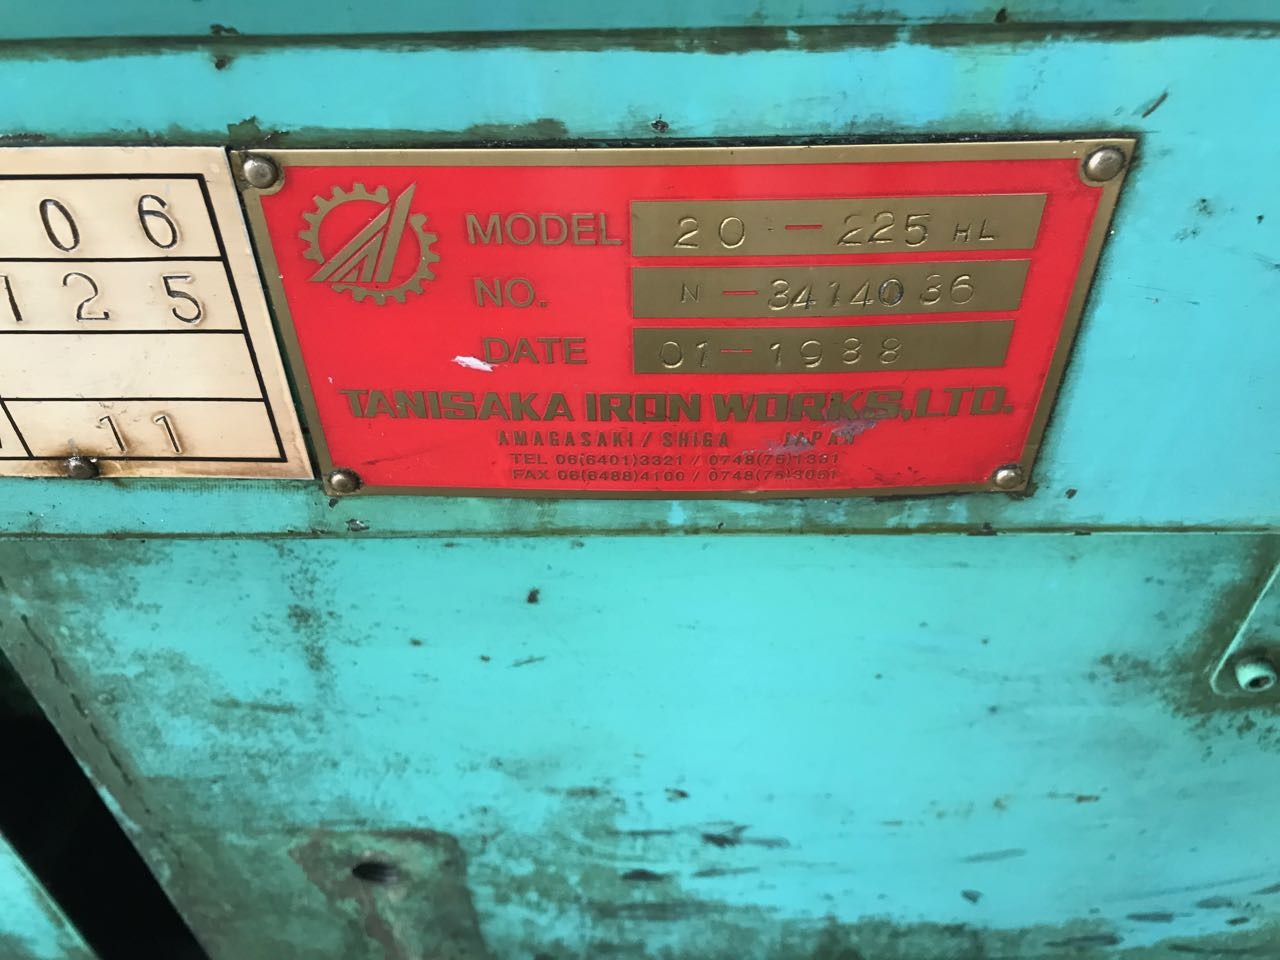 Tanisaka Model 20-225 High Speed Thread Roller